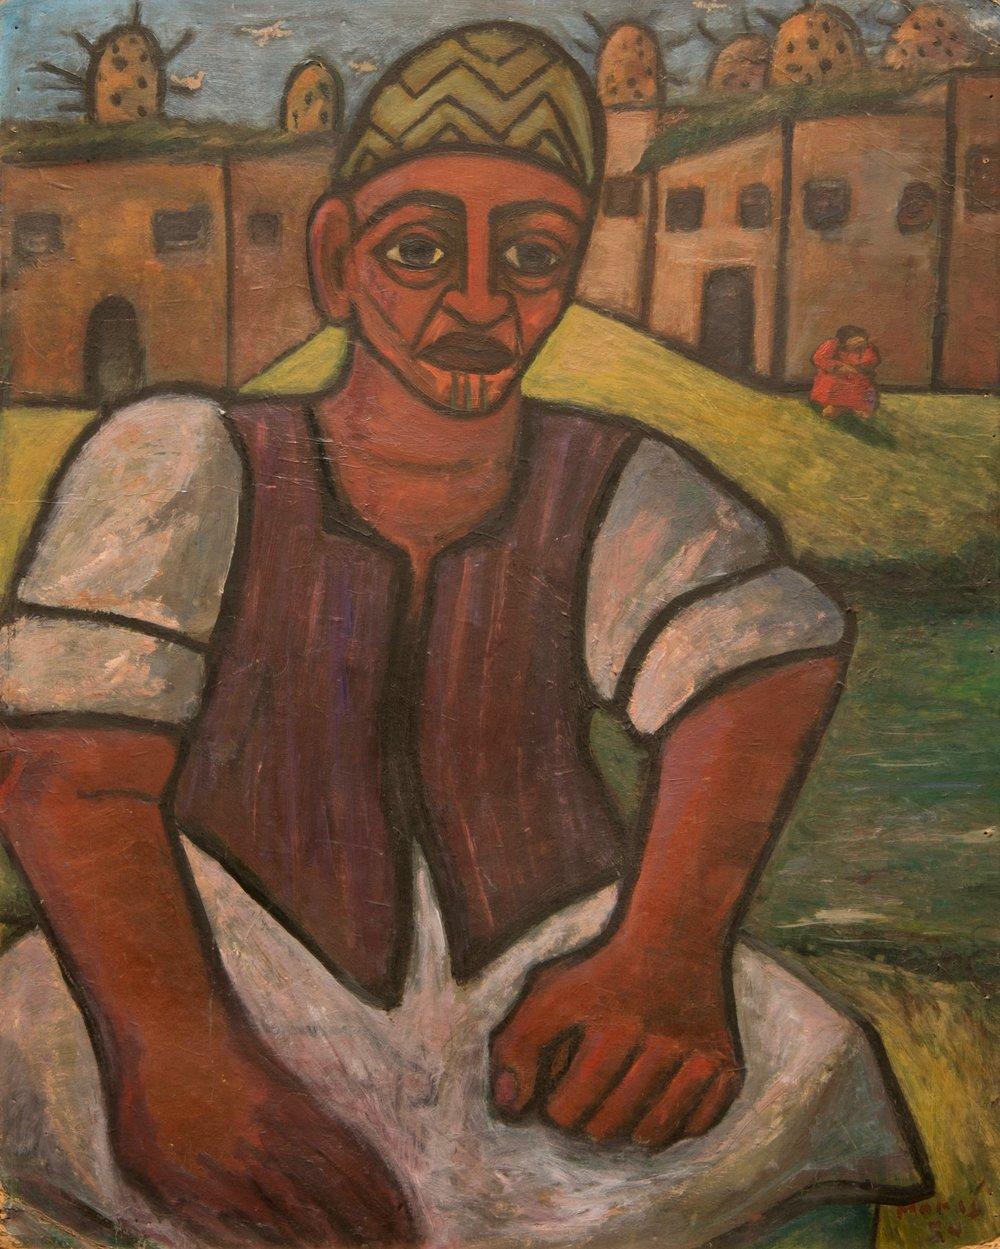 Ahmed-Morsi-Untitled-(Fallah)-Alexabdria-1954.jpg